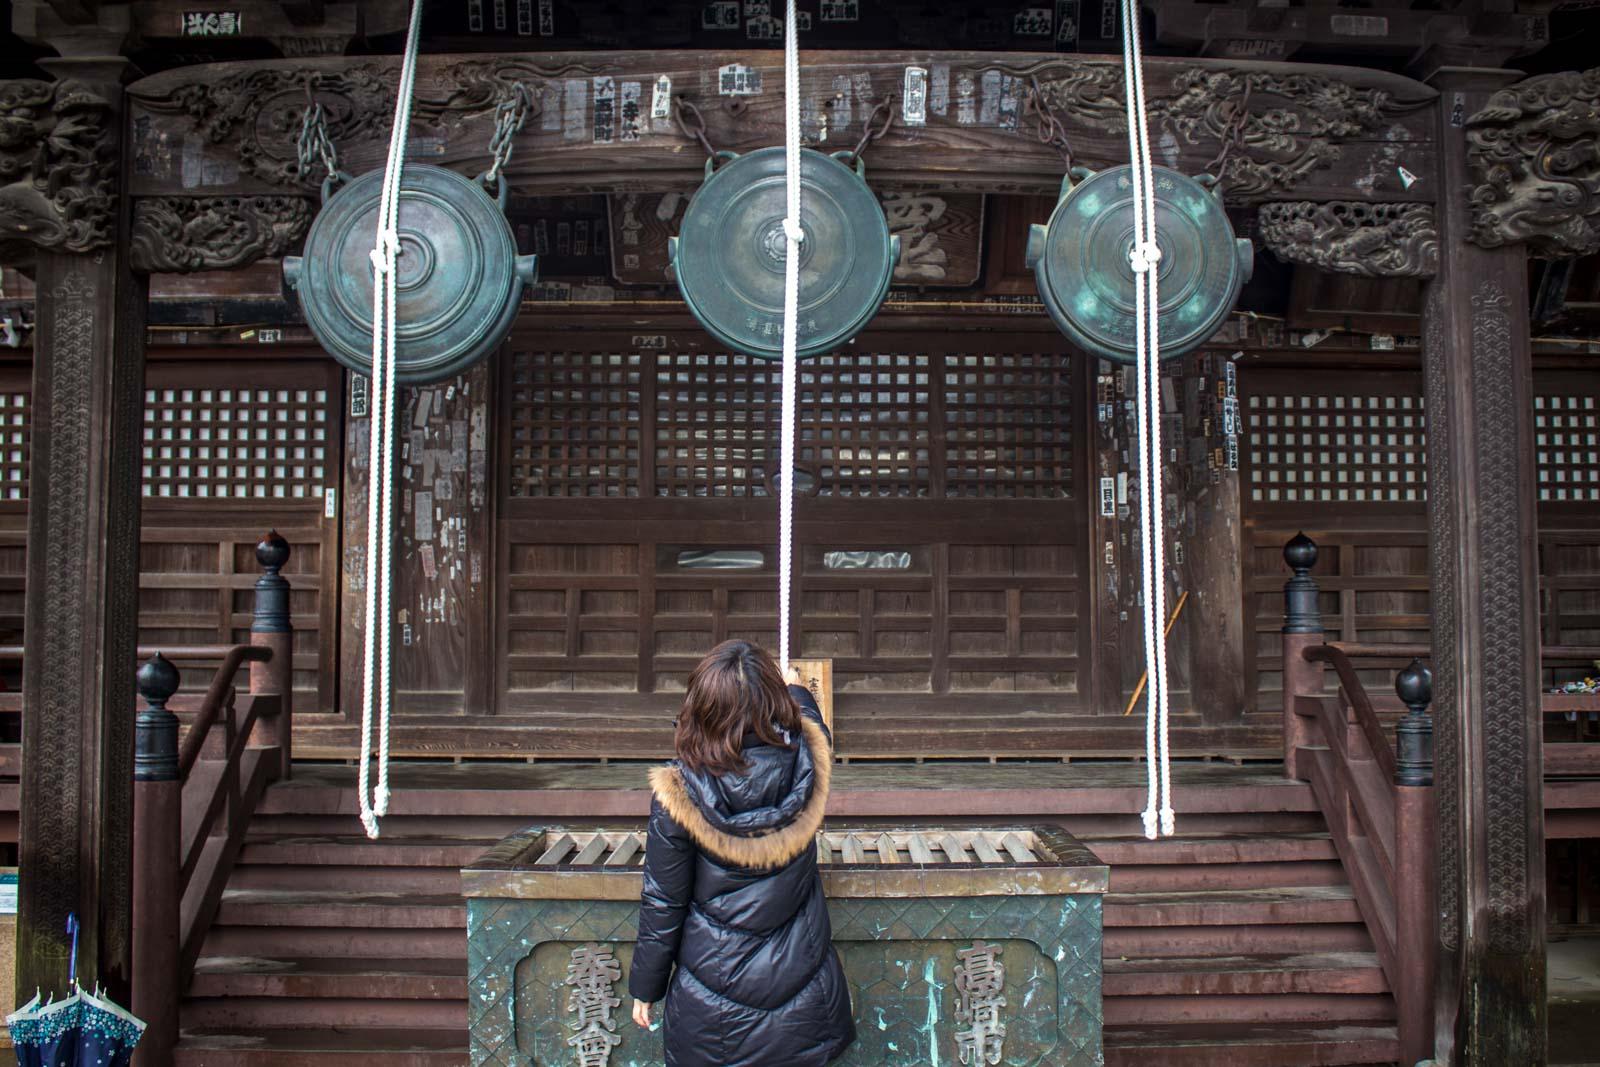 daruma dolls, japan, japanese grumpy dolls, takasaki daruma temple in gunma